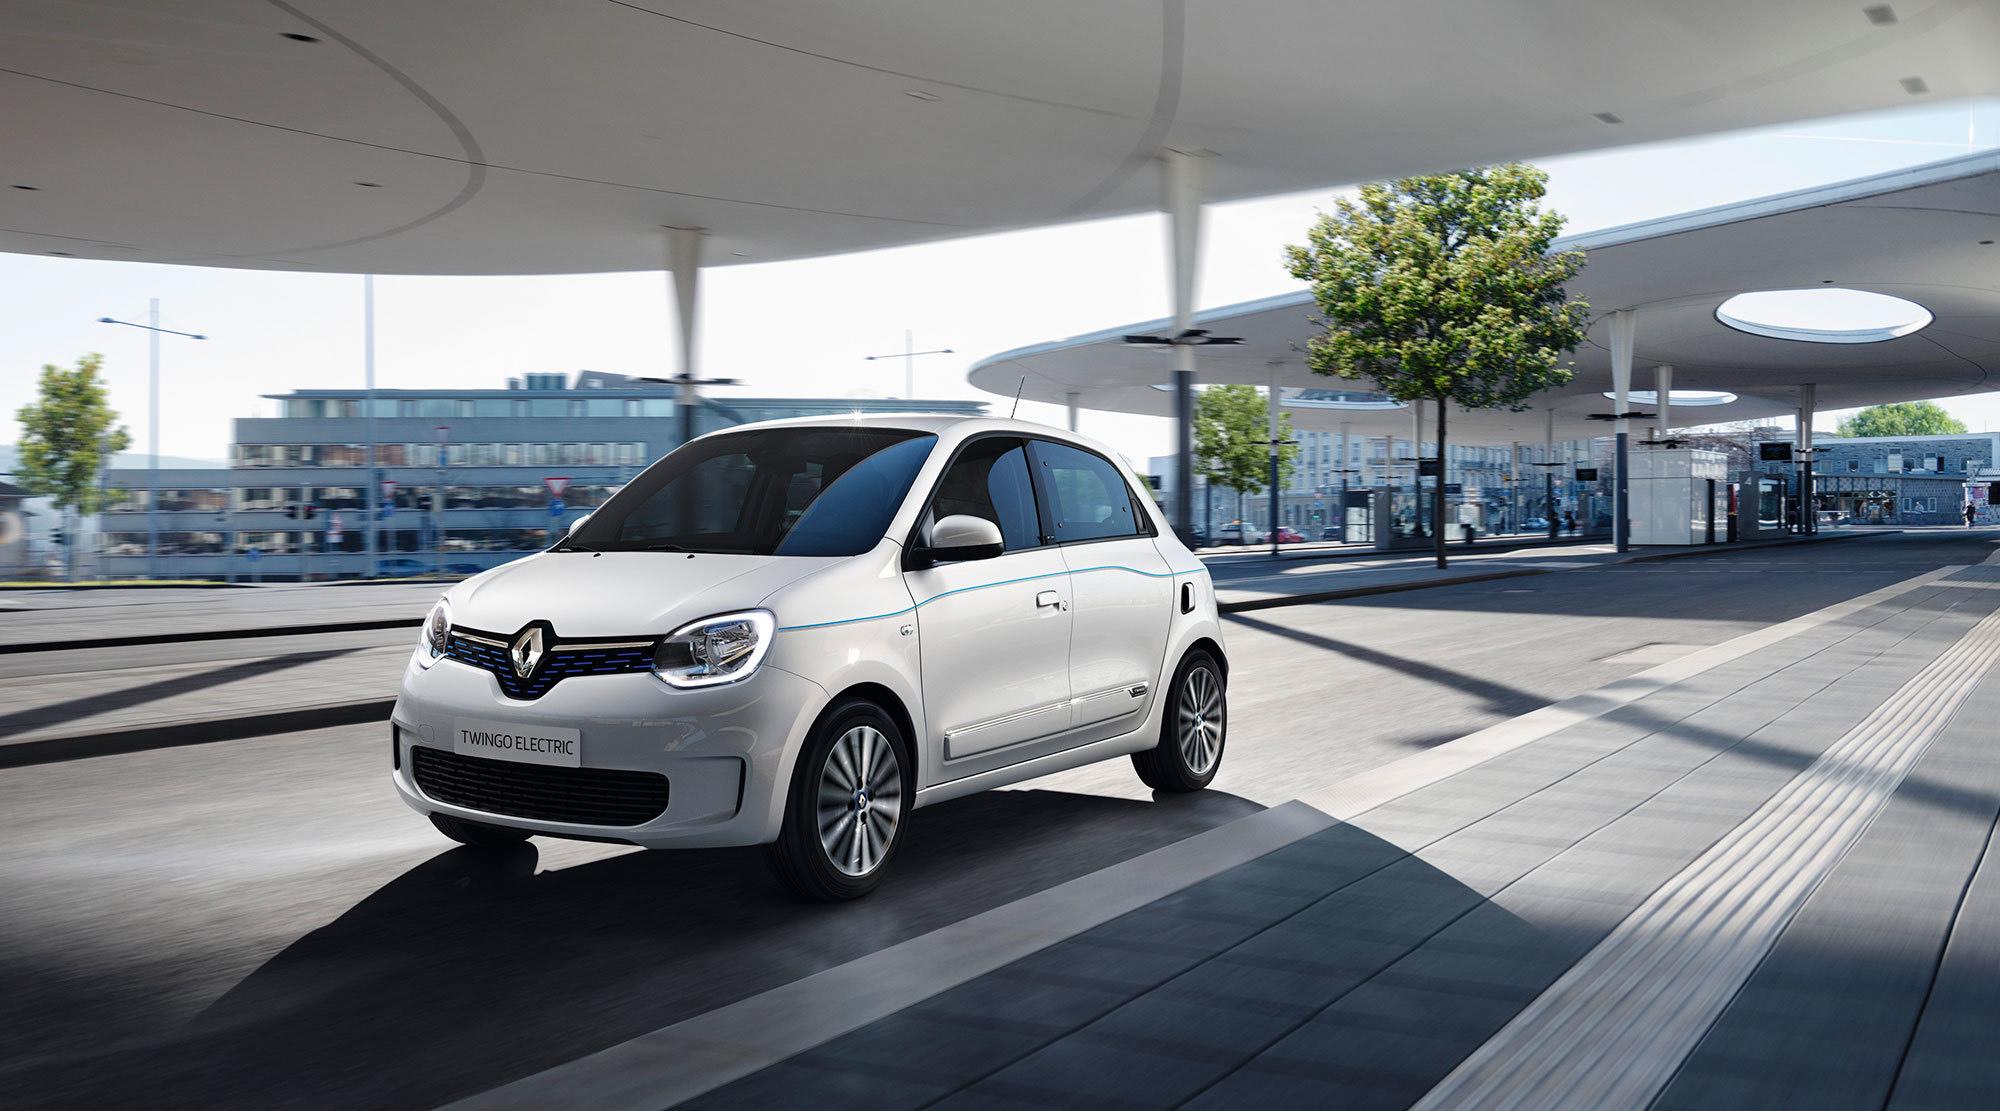 Renault Twingo-home